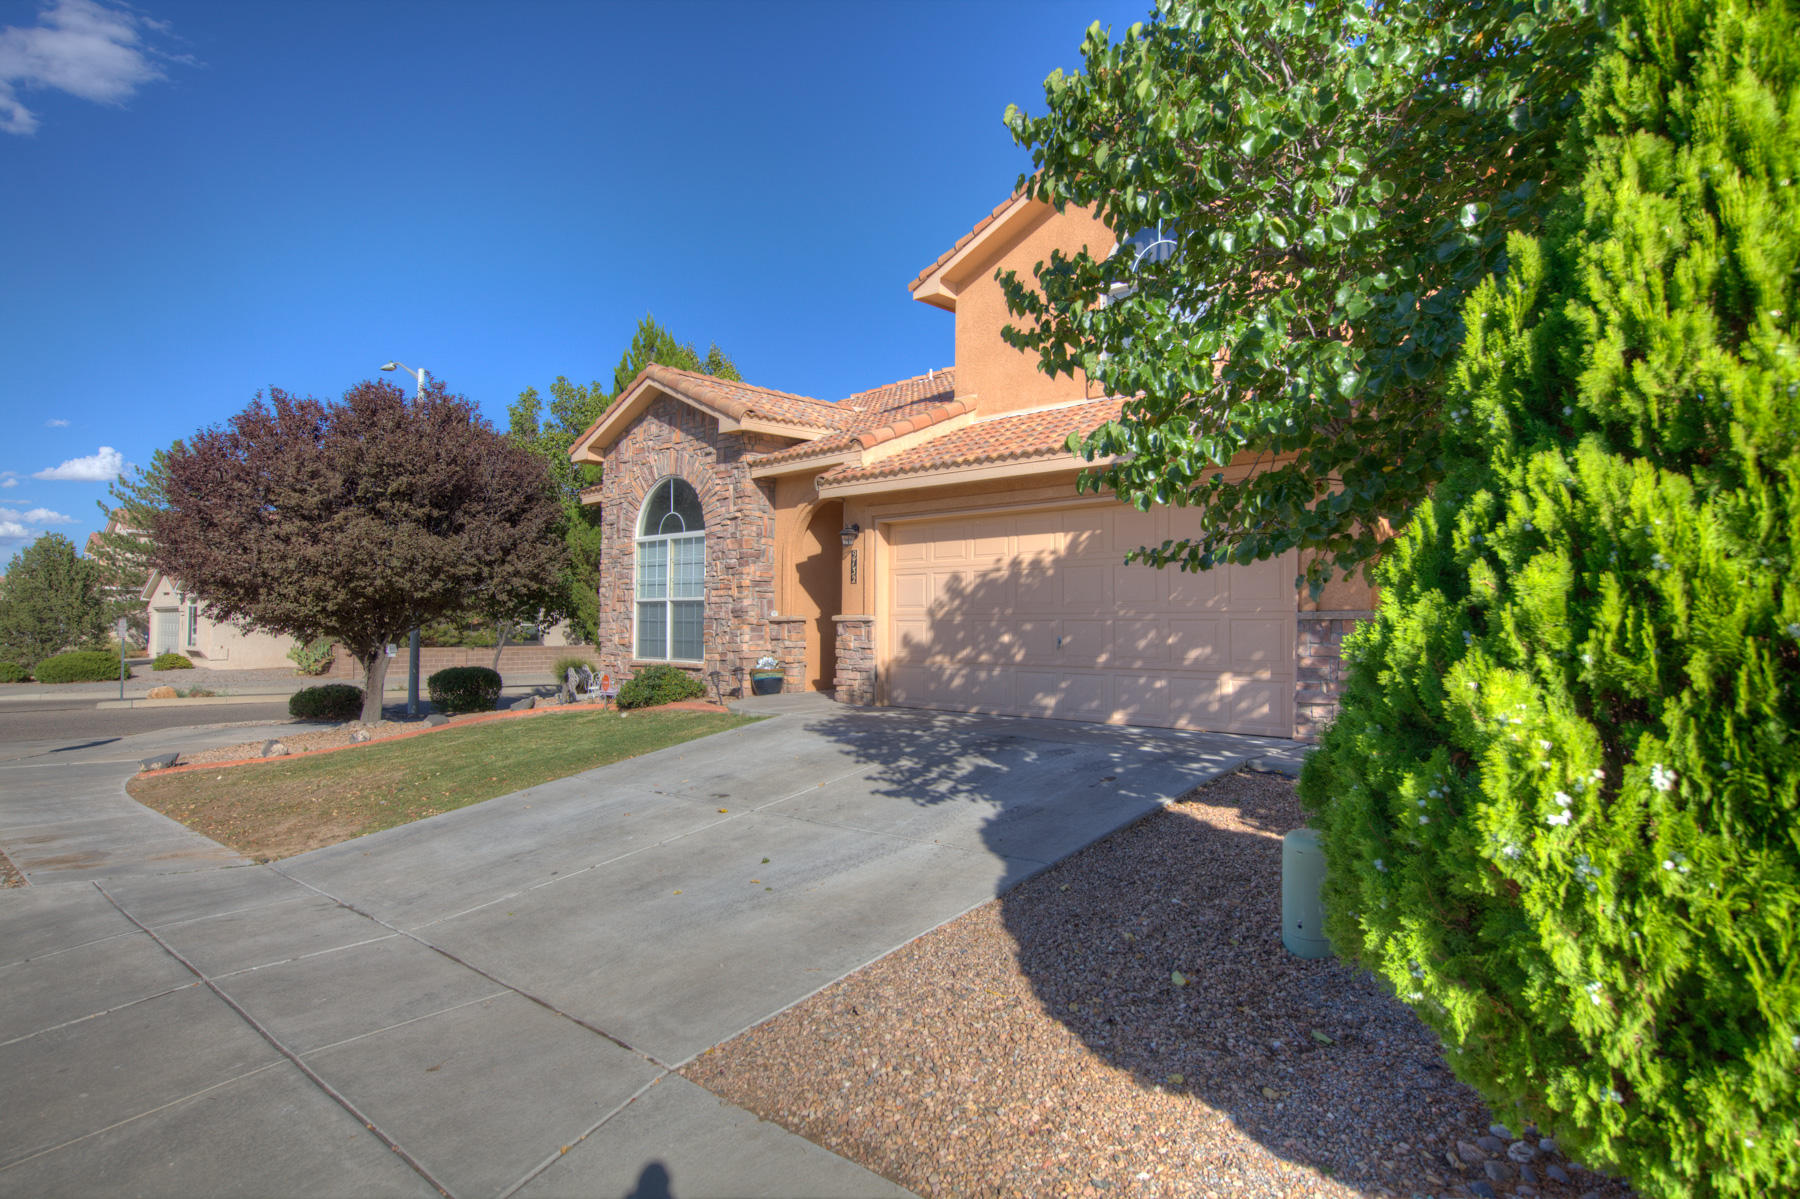 9732 NW Kokopelli Drive, Northwest Albuquerque and Northwest Heights, New Mexico